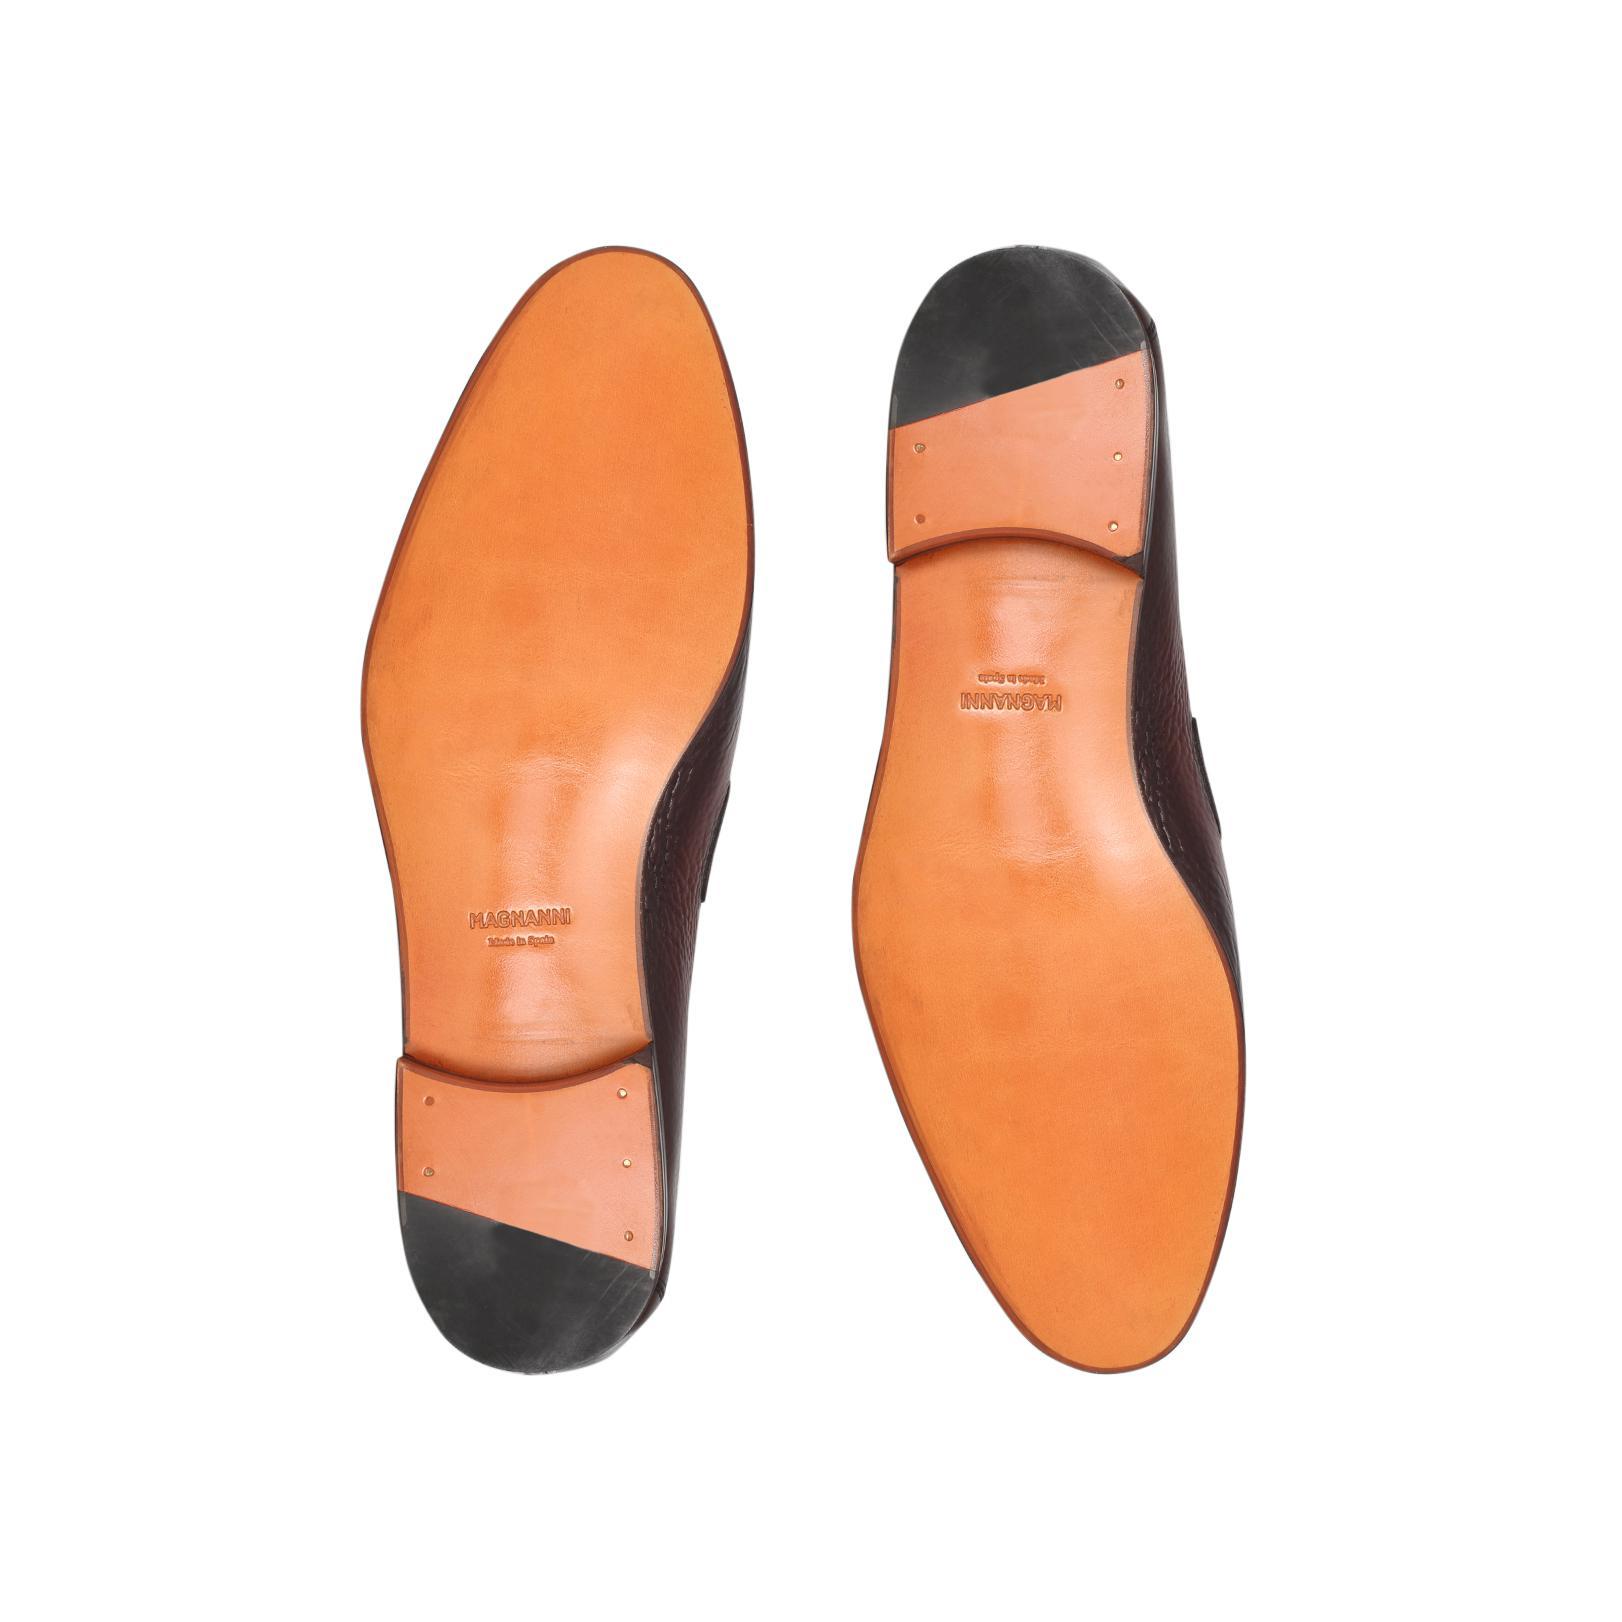 Magnanni Leather Plait Trim Loafer in Tan (Brown) for Men